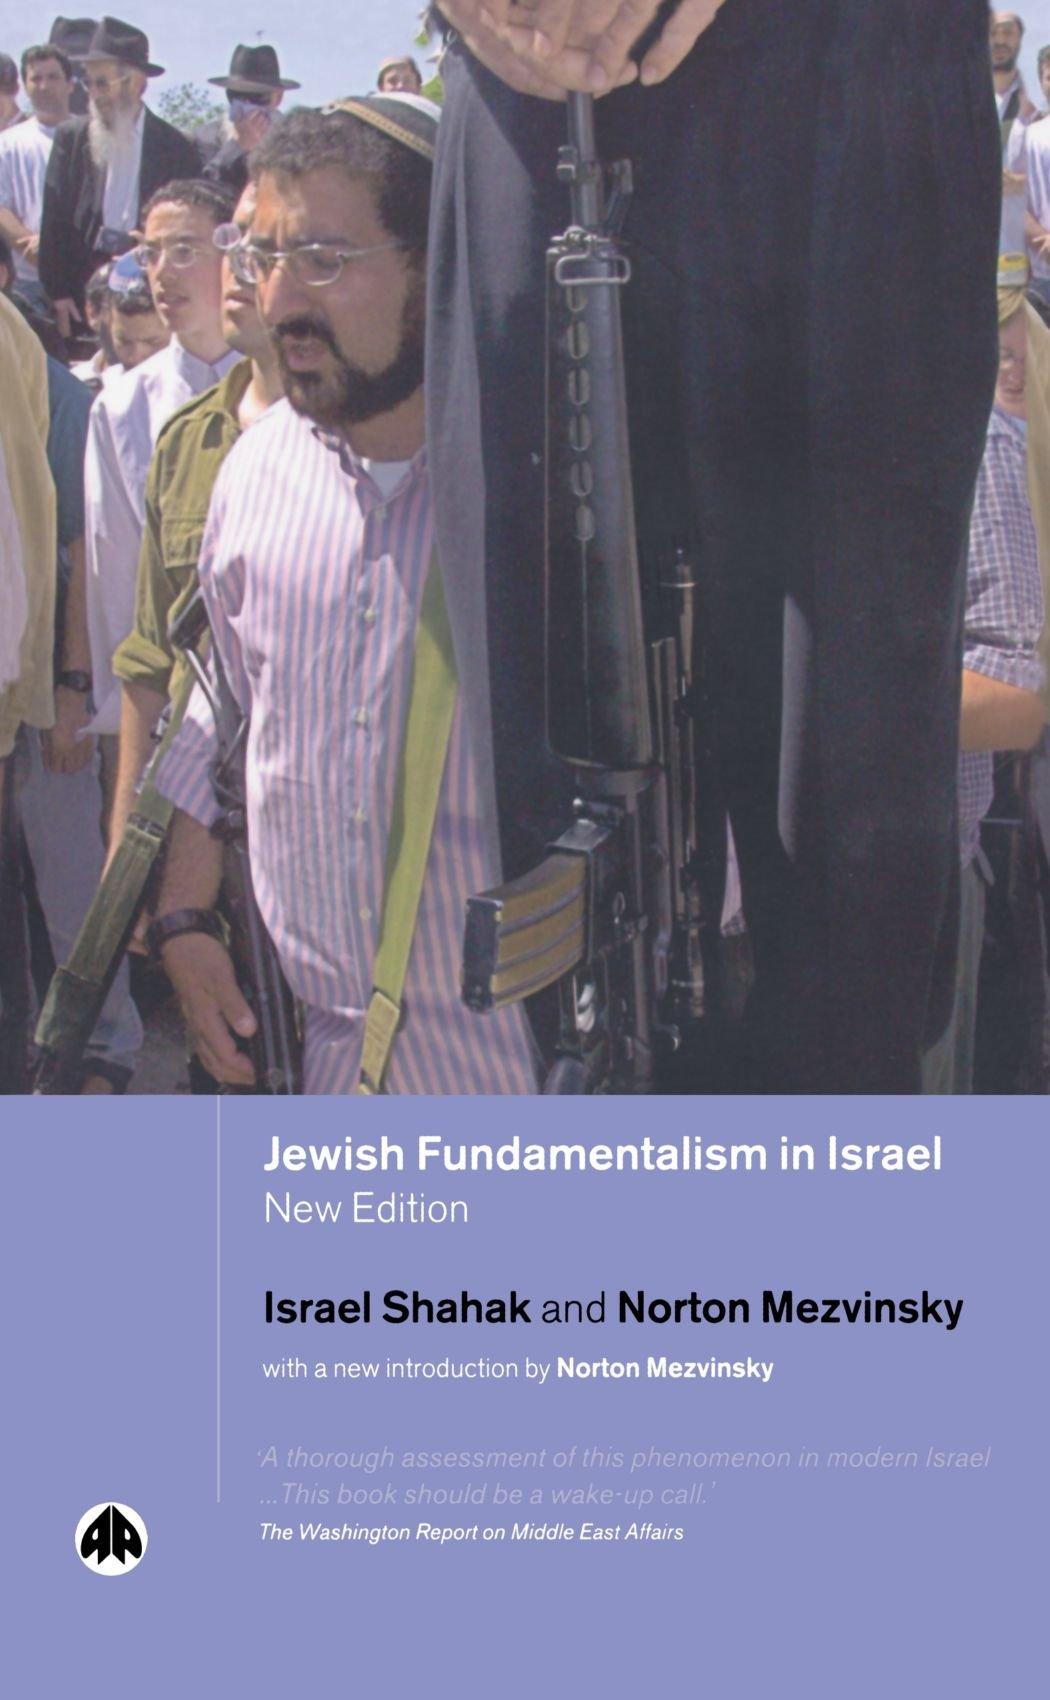 Jewish Fundamentalism in Israel (Pluto Middle Eastern Studies S) Paperback  – September 20, 2004